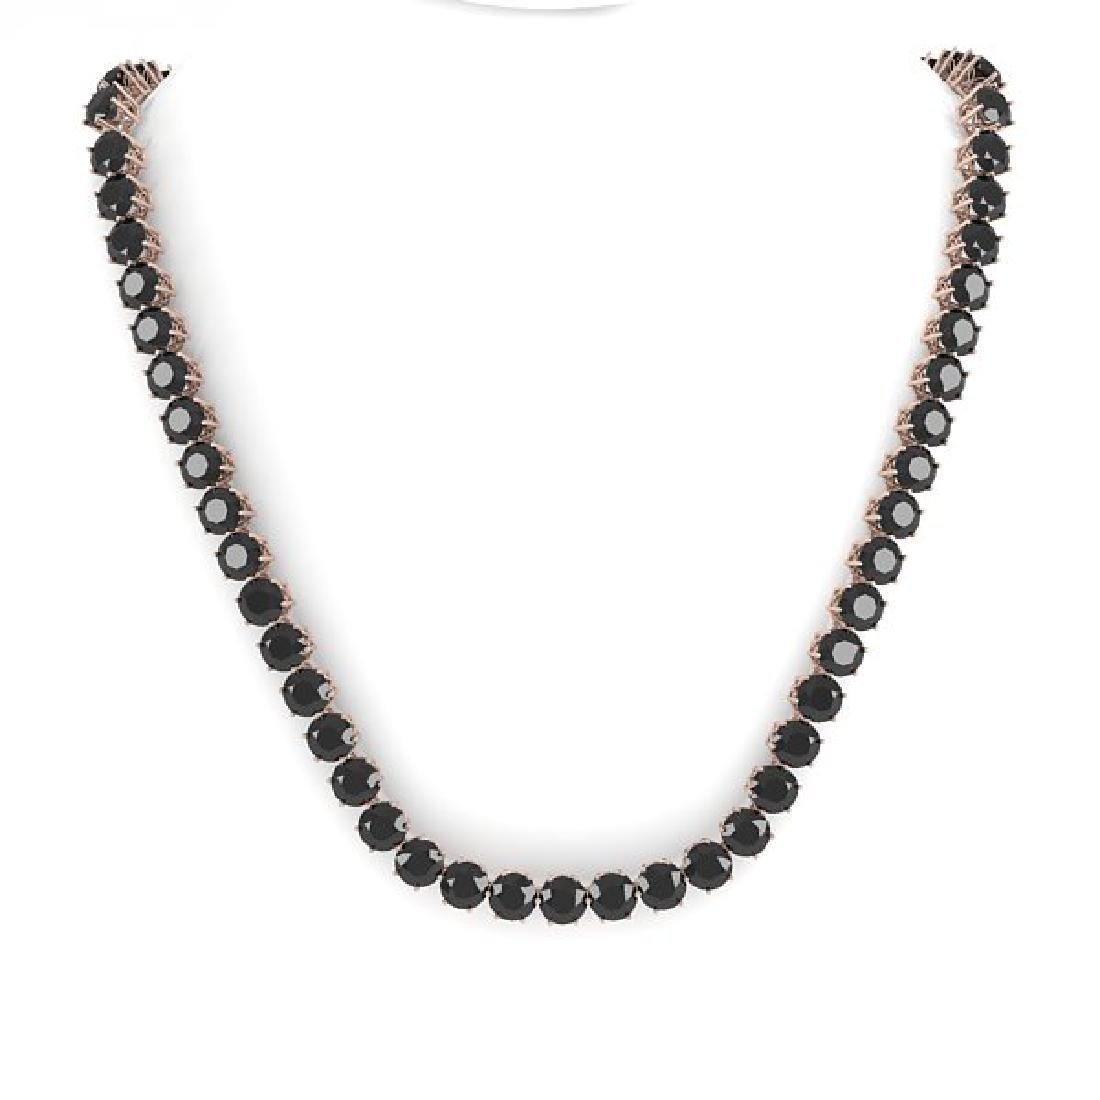 36 CTW Certified Black VS Diamond Necklace 14K Rose - 3